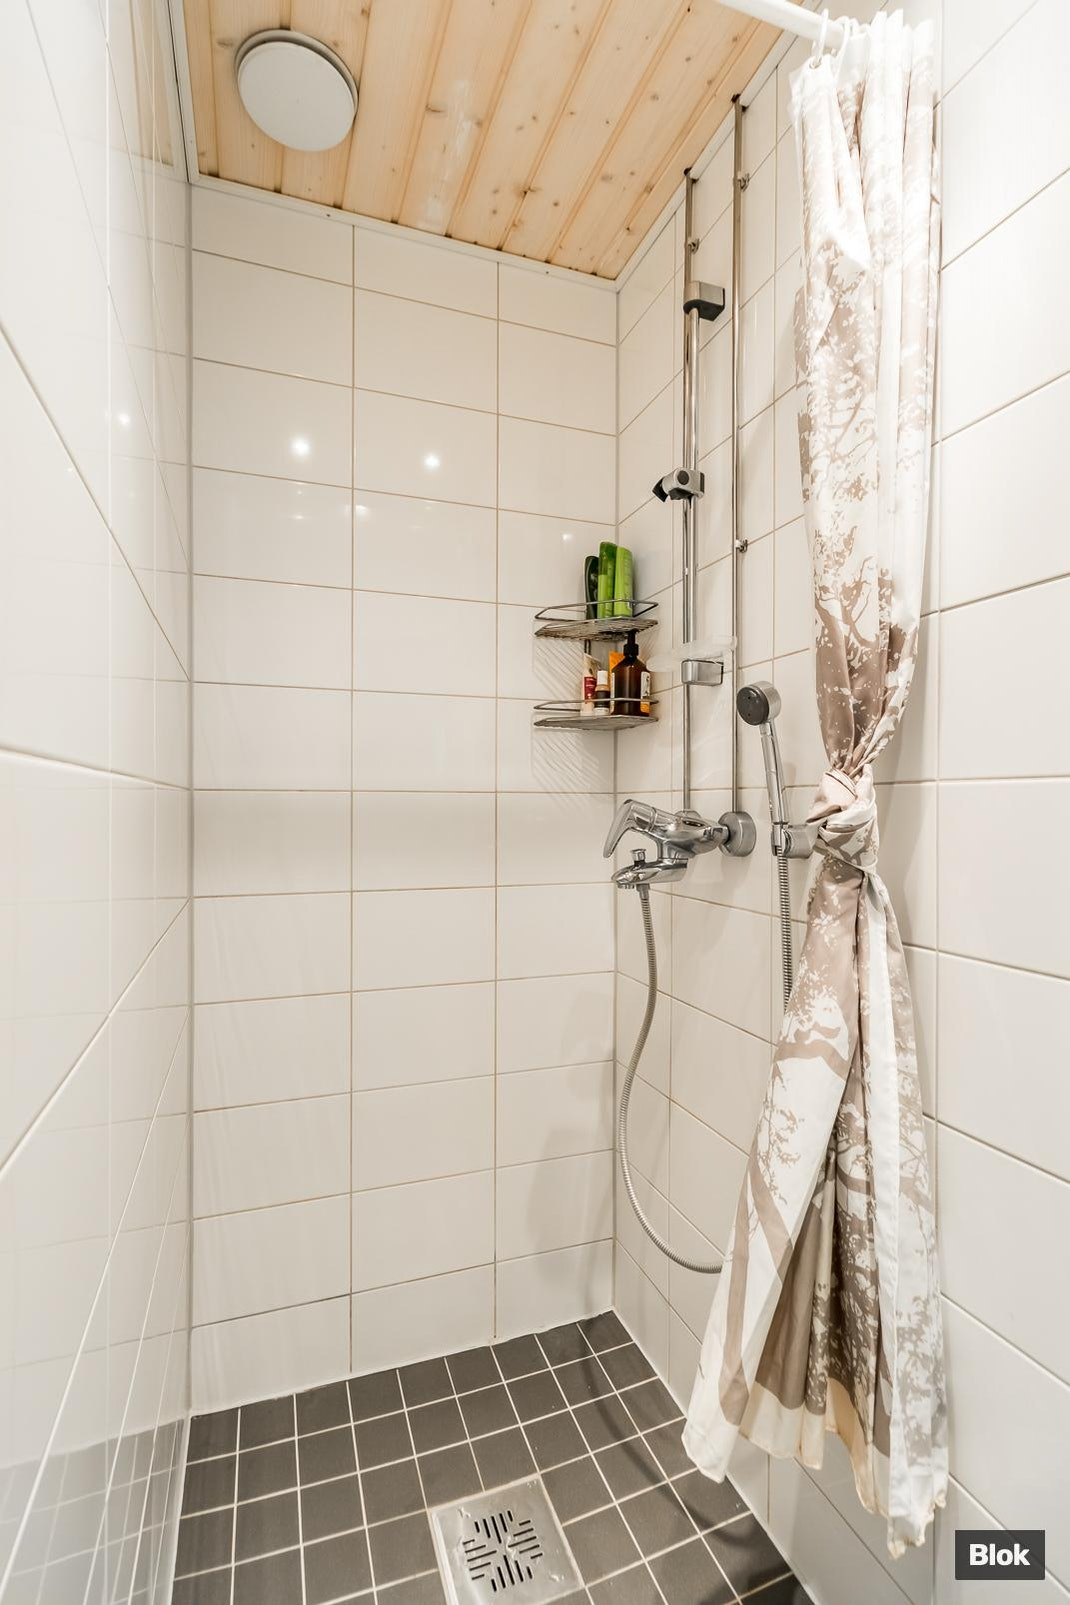 Aleksis Kiven katu 56 C 71 WC & Suihkuhuone